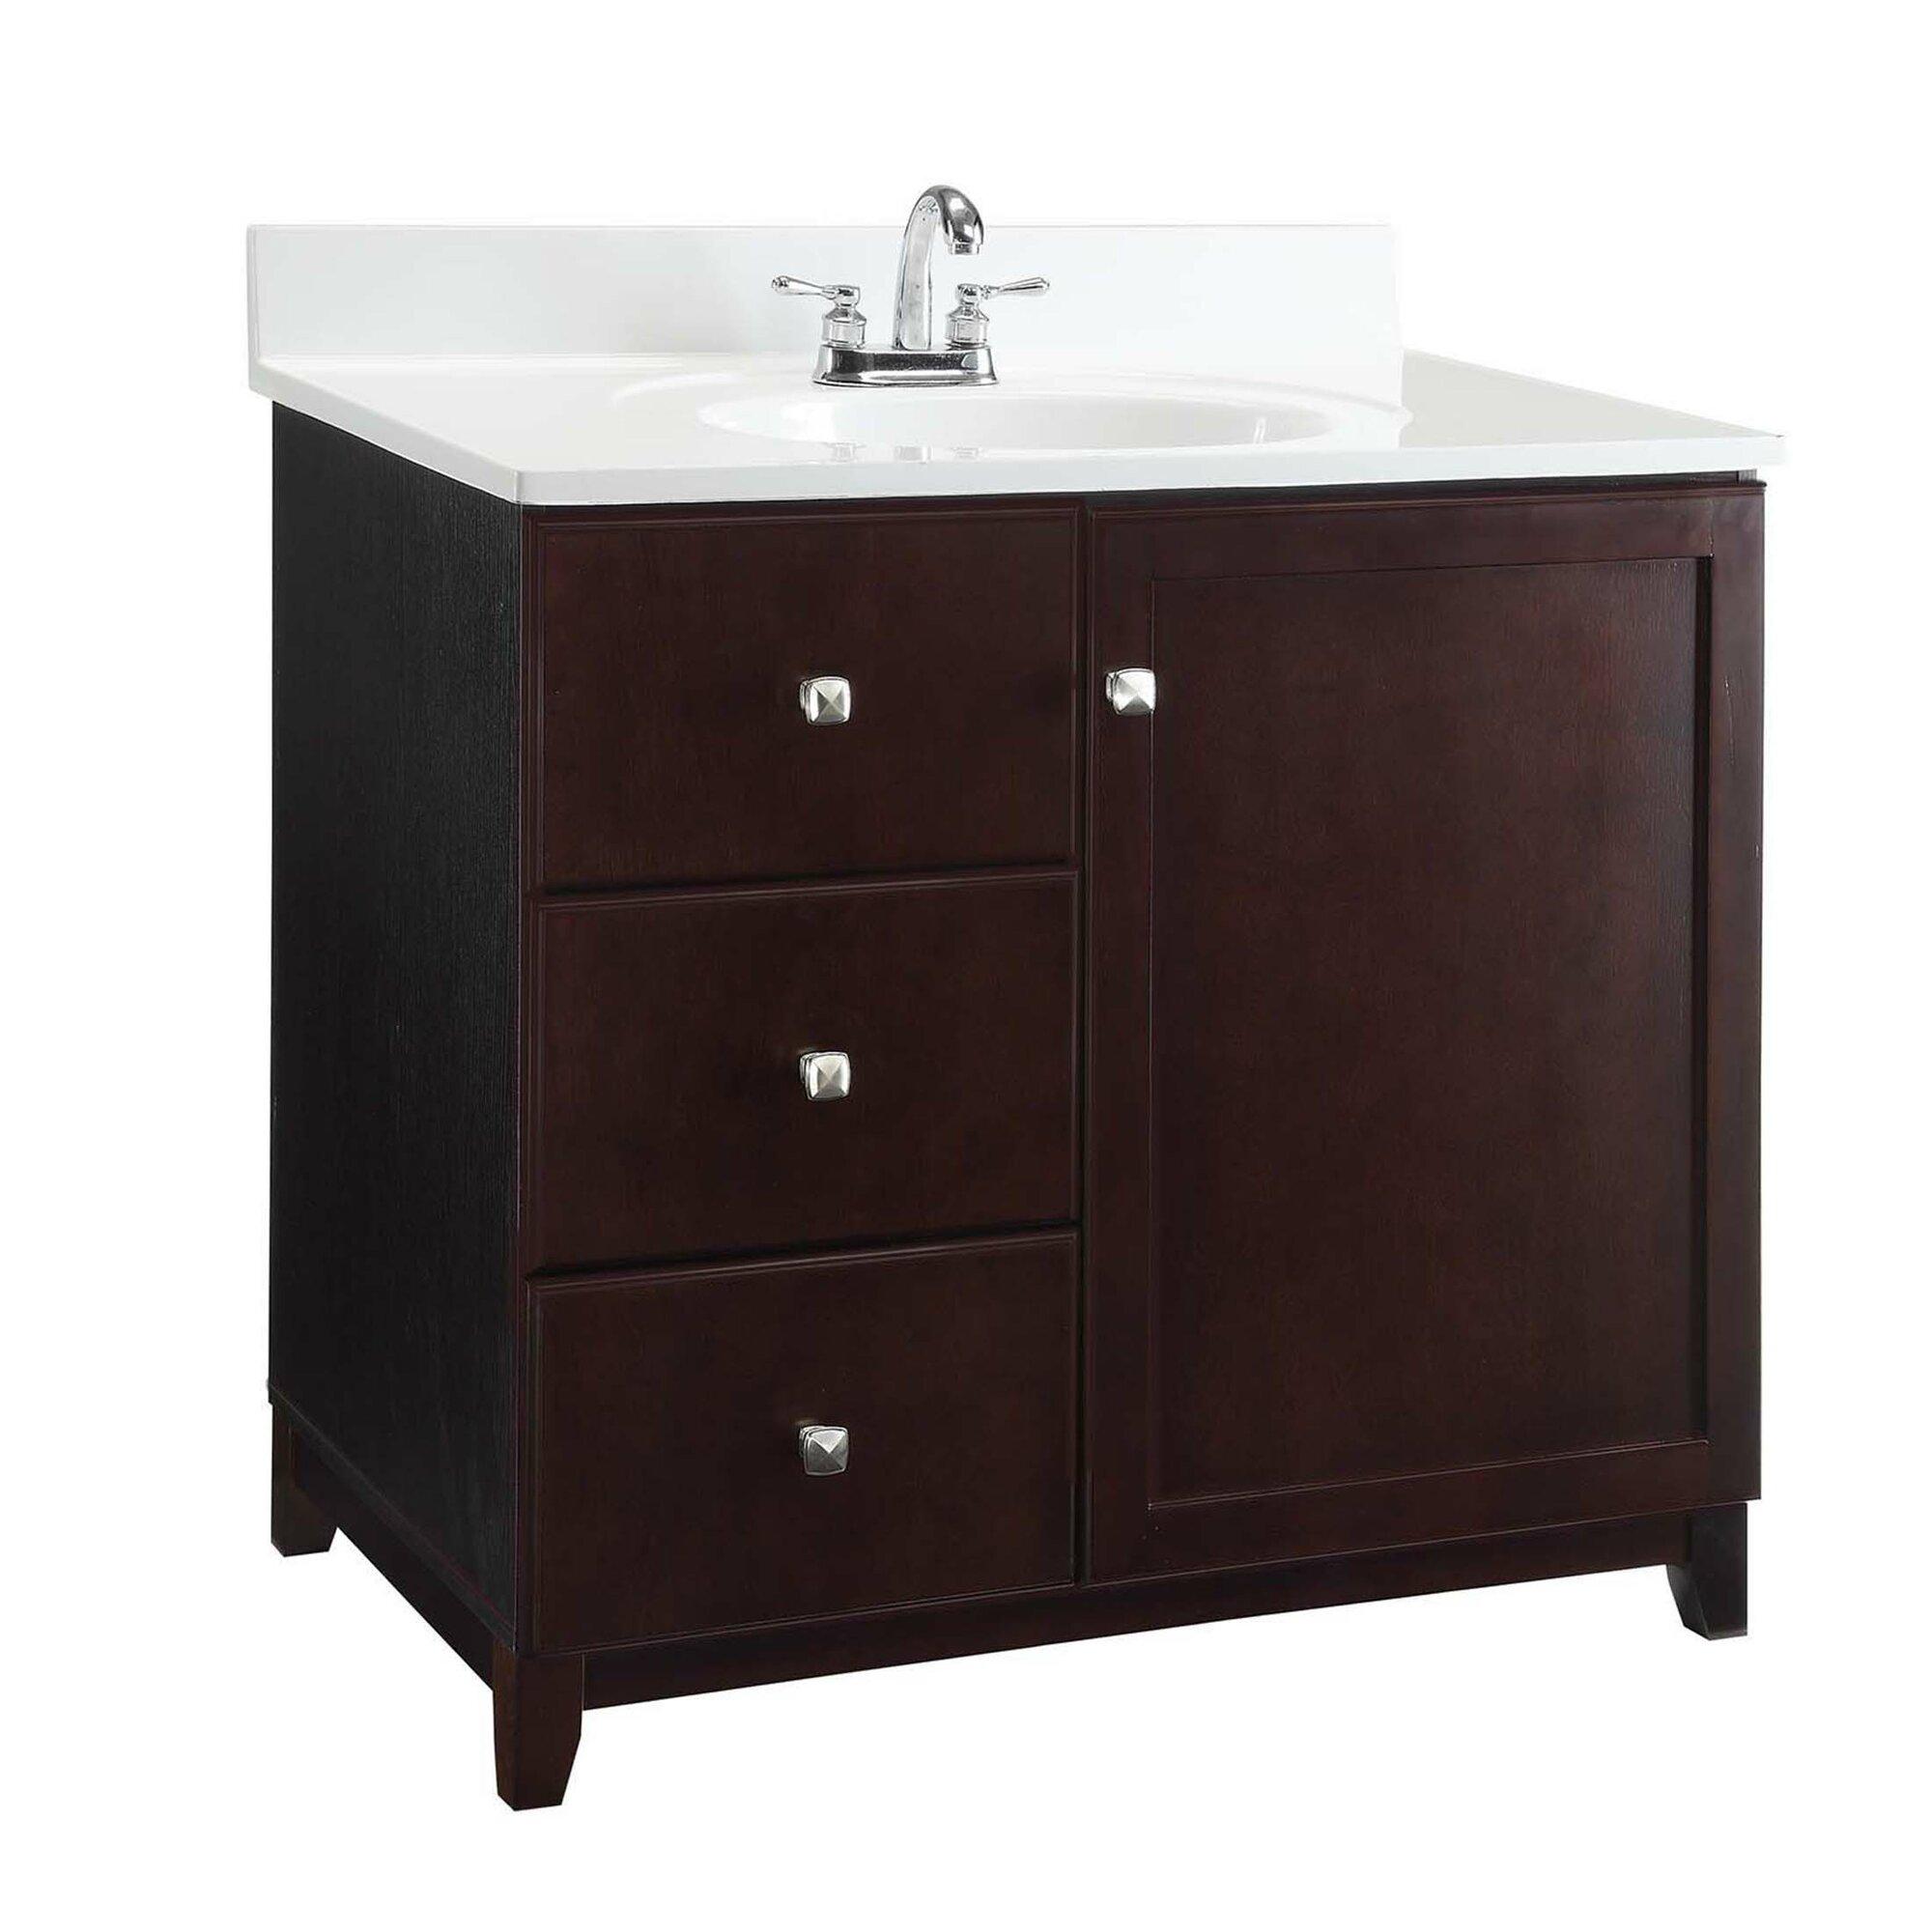 design house 30 single bathroom vanity base ebay